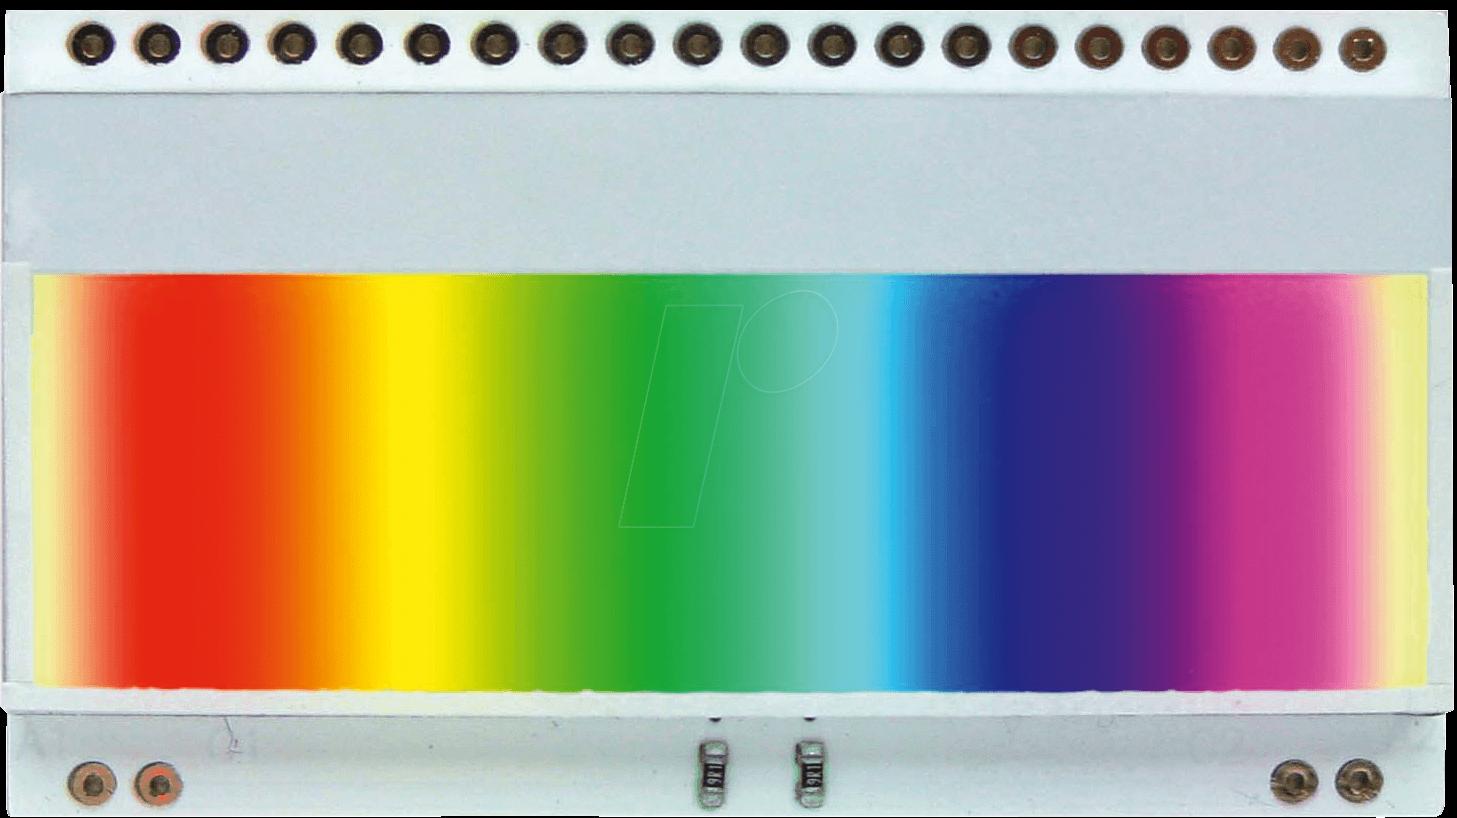 ea led55x31 r led beleuchtung f r ea dogm132 52 x 16 mm rot bei reichelt elektronik. Black Bedroom Furniture Sets. Home Design Ideas